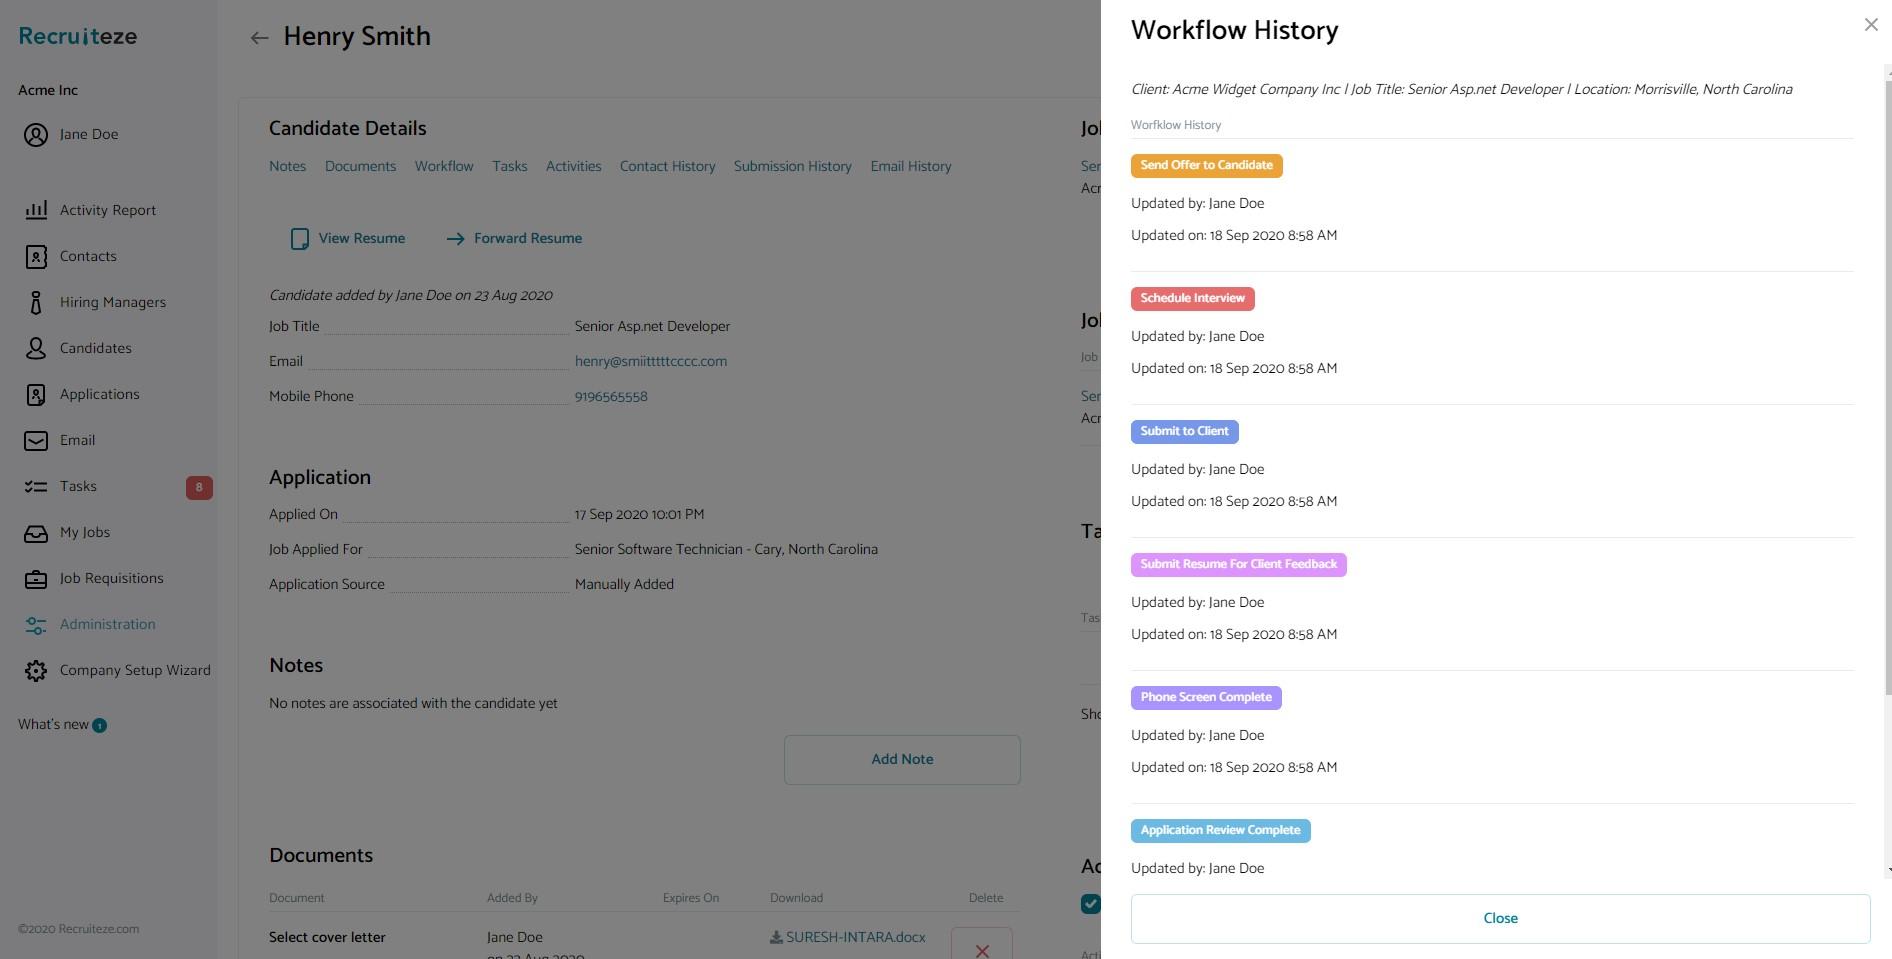 Candidate Management System: Workflow Detail